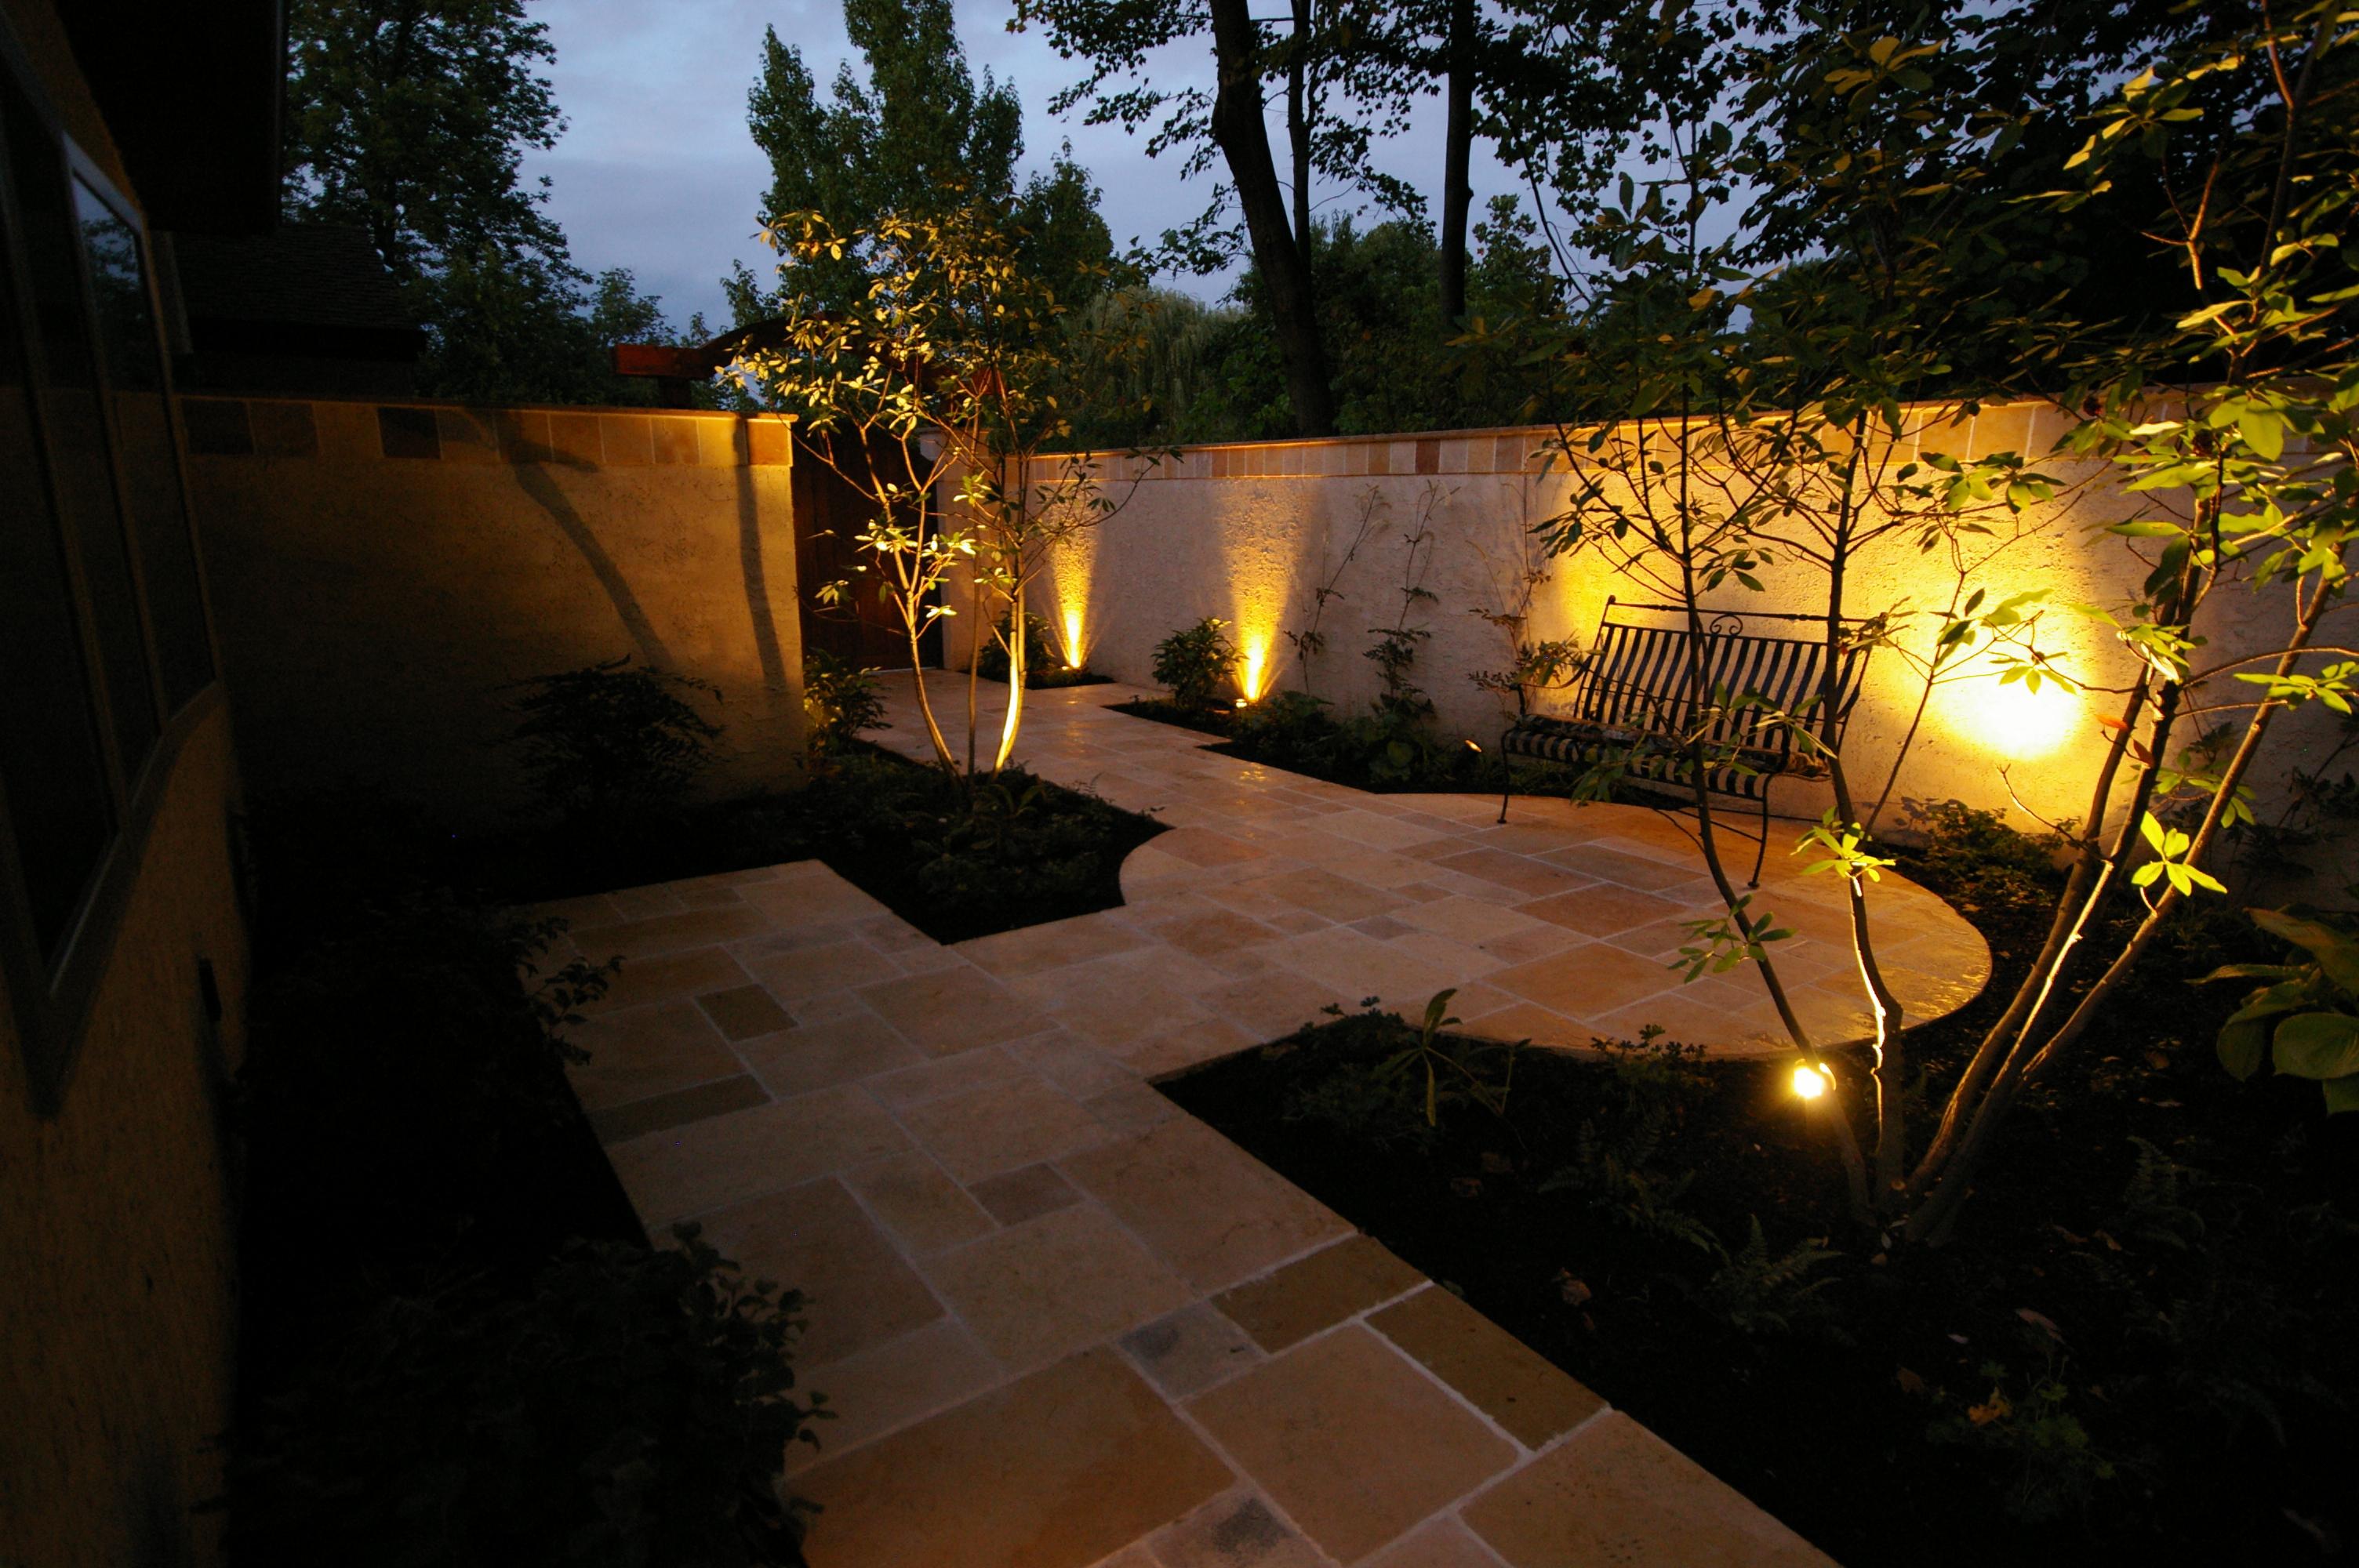 Landscape Lighting Design And Installation A